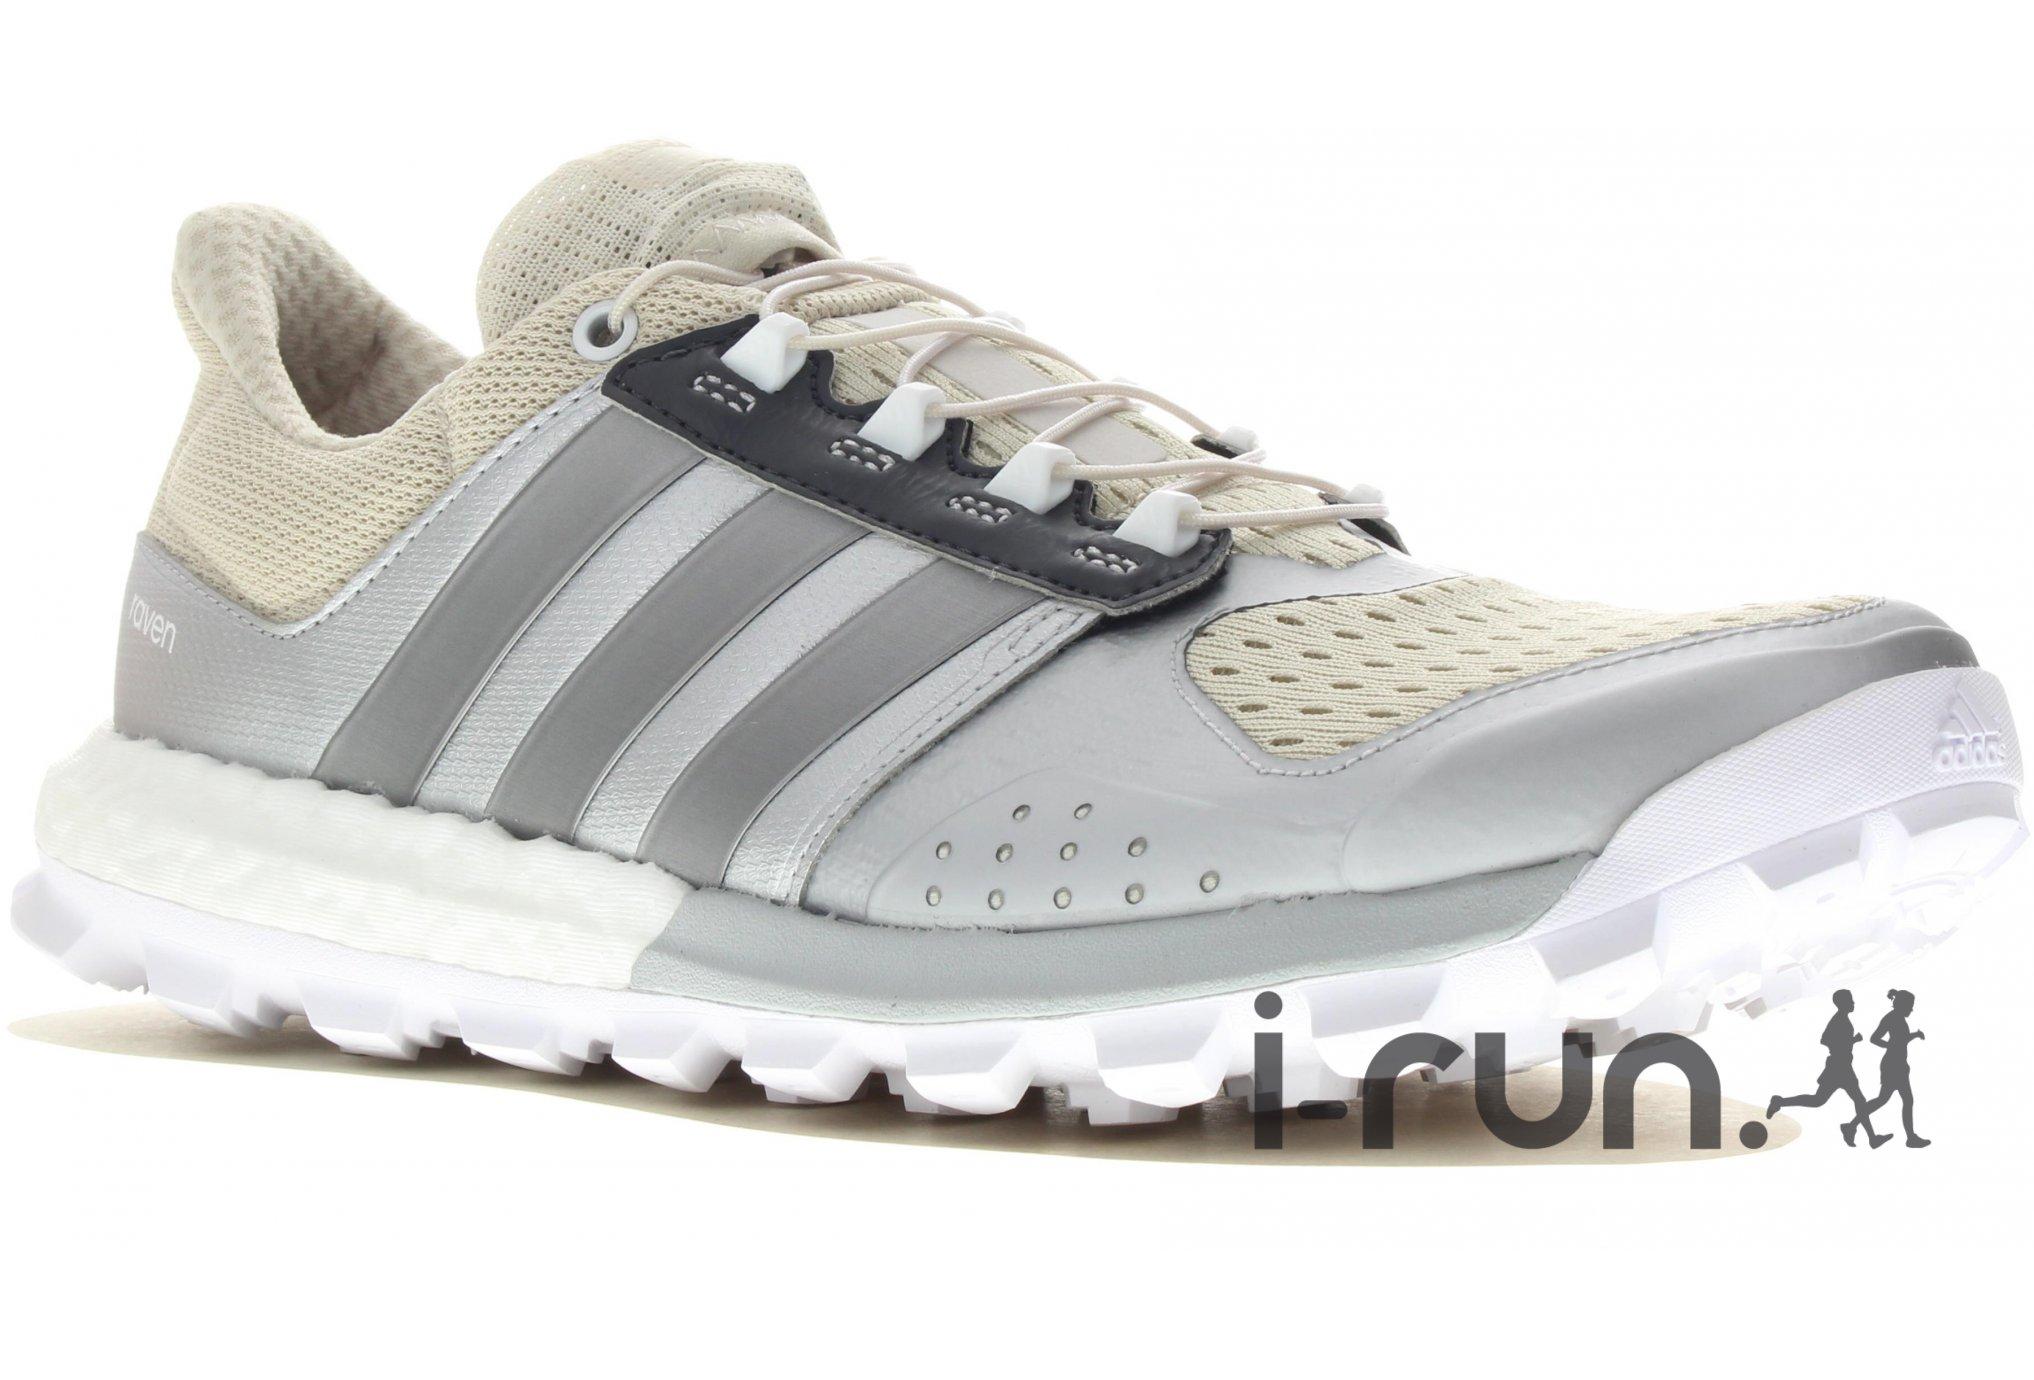 Adidas Adistar raven boost w chaussures running femme